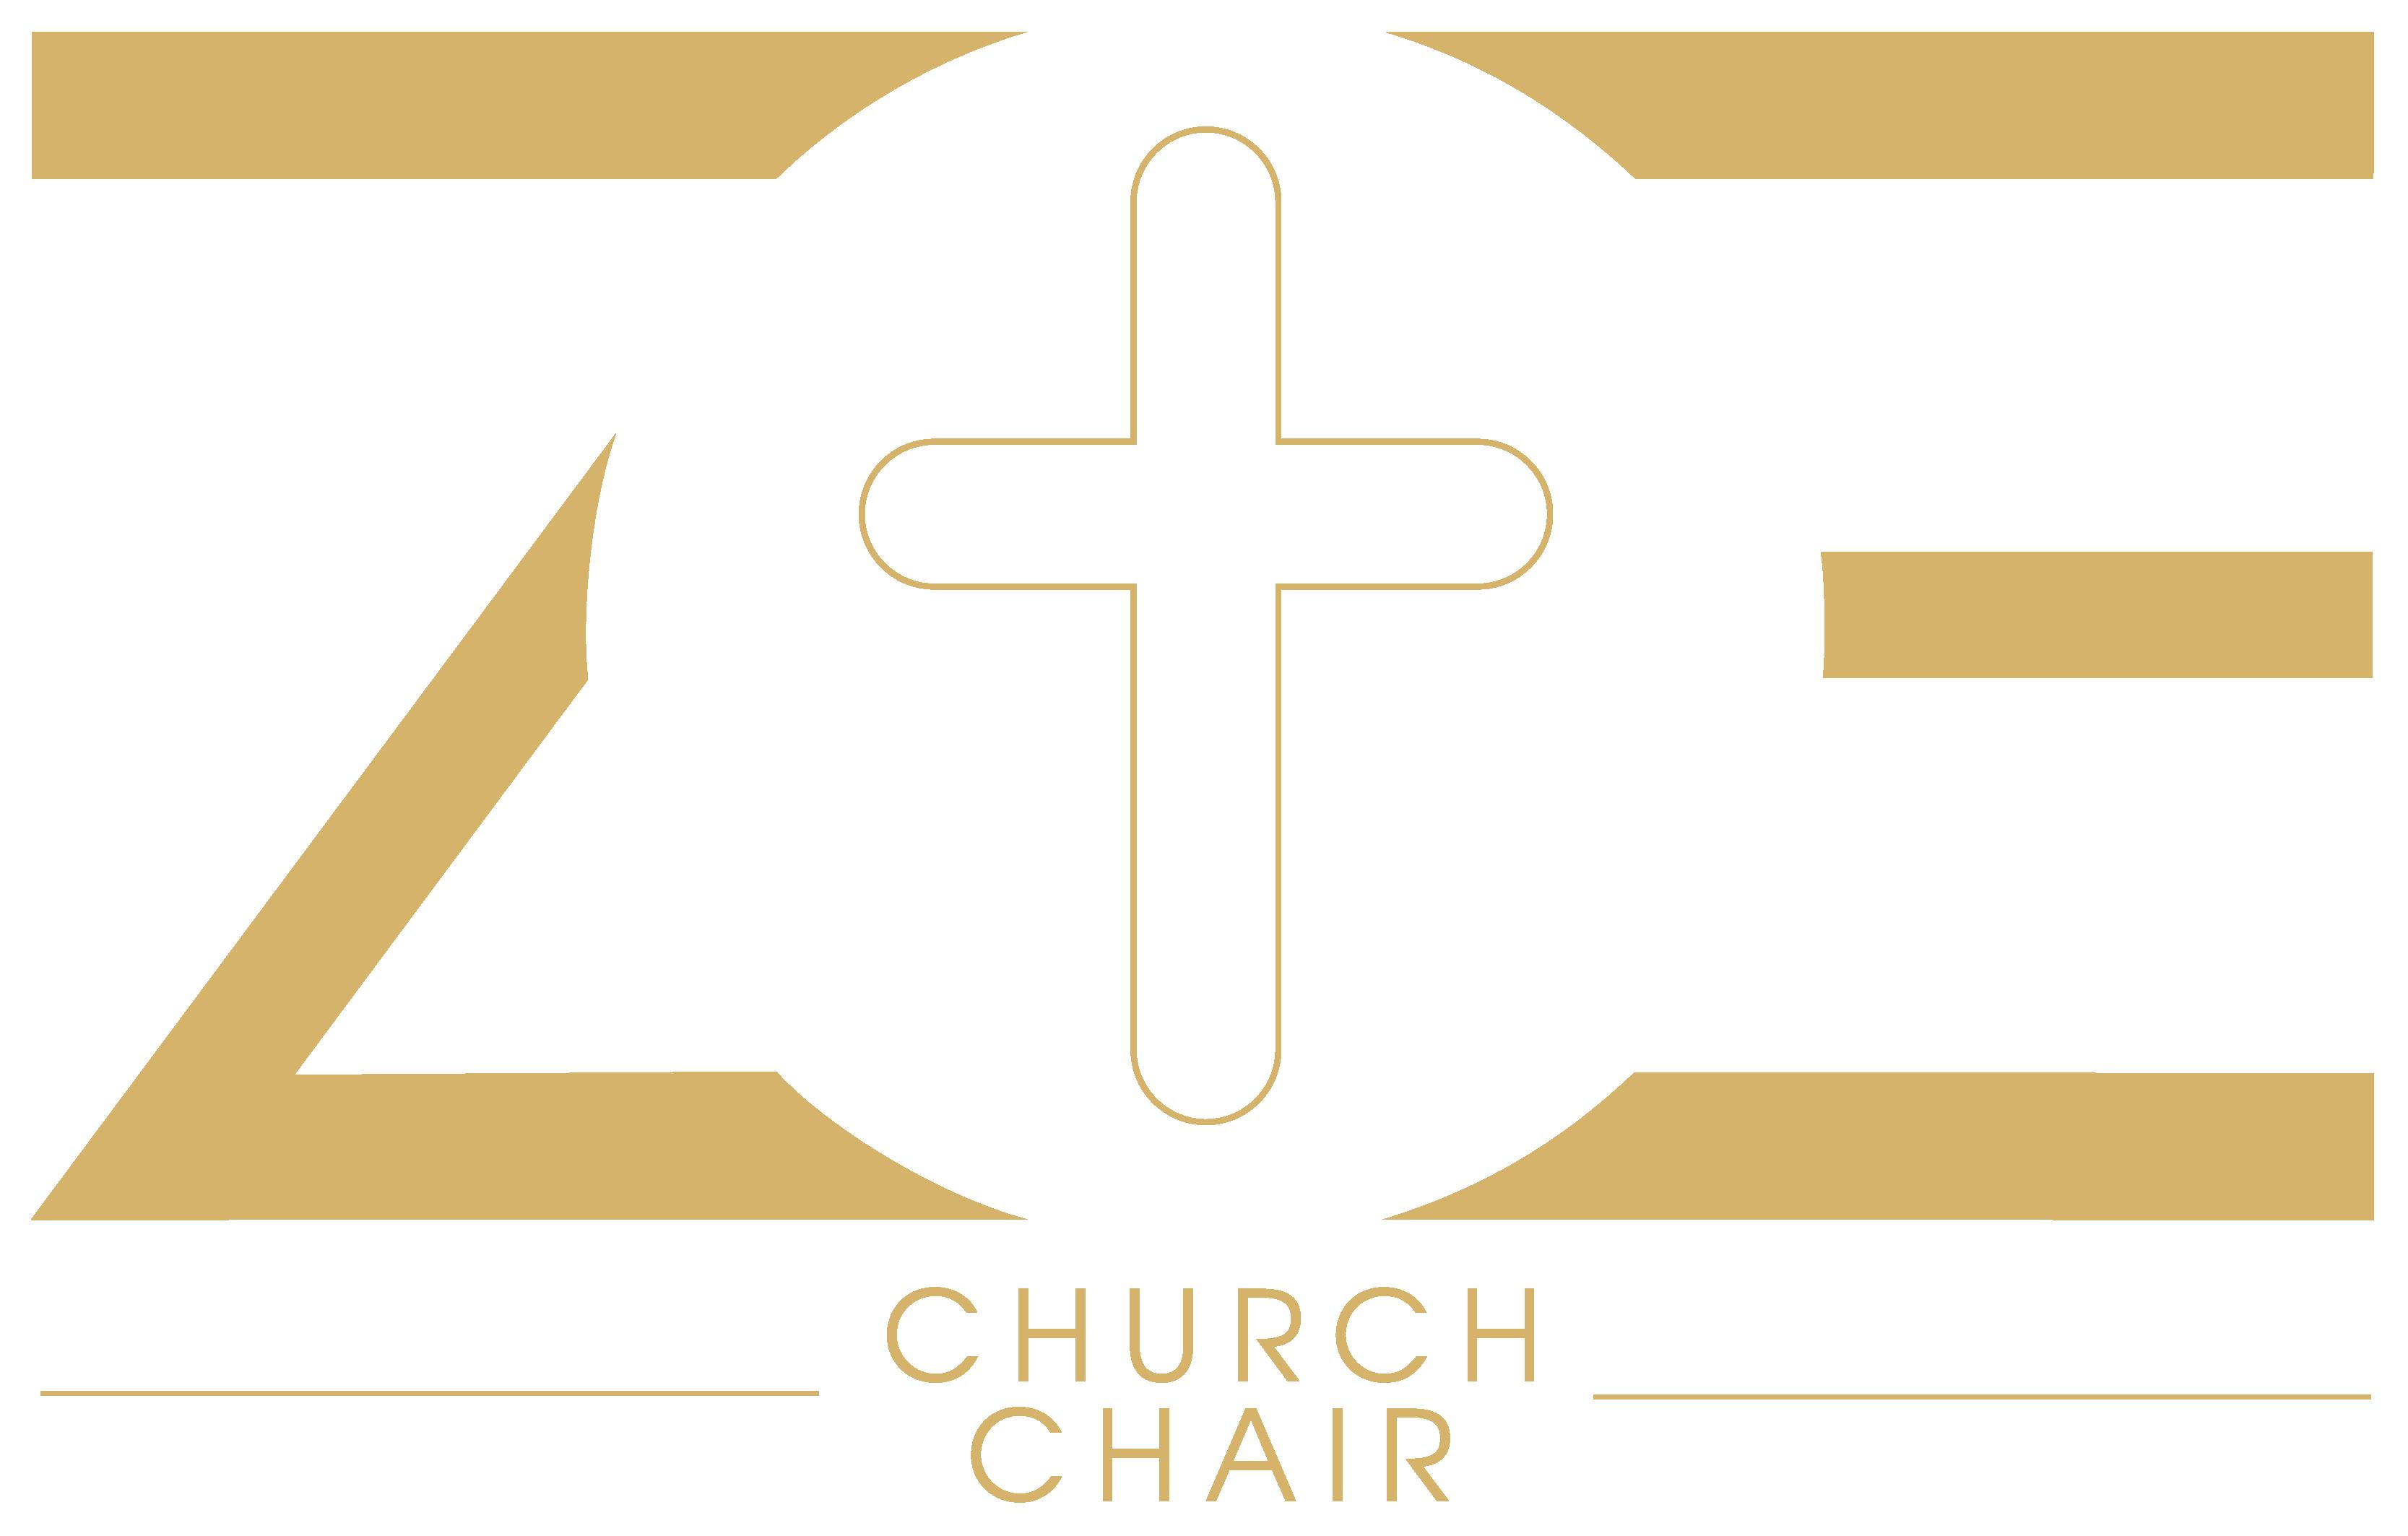 kirchenstuehle.at Logo